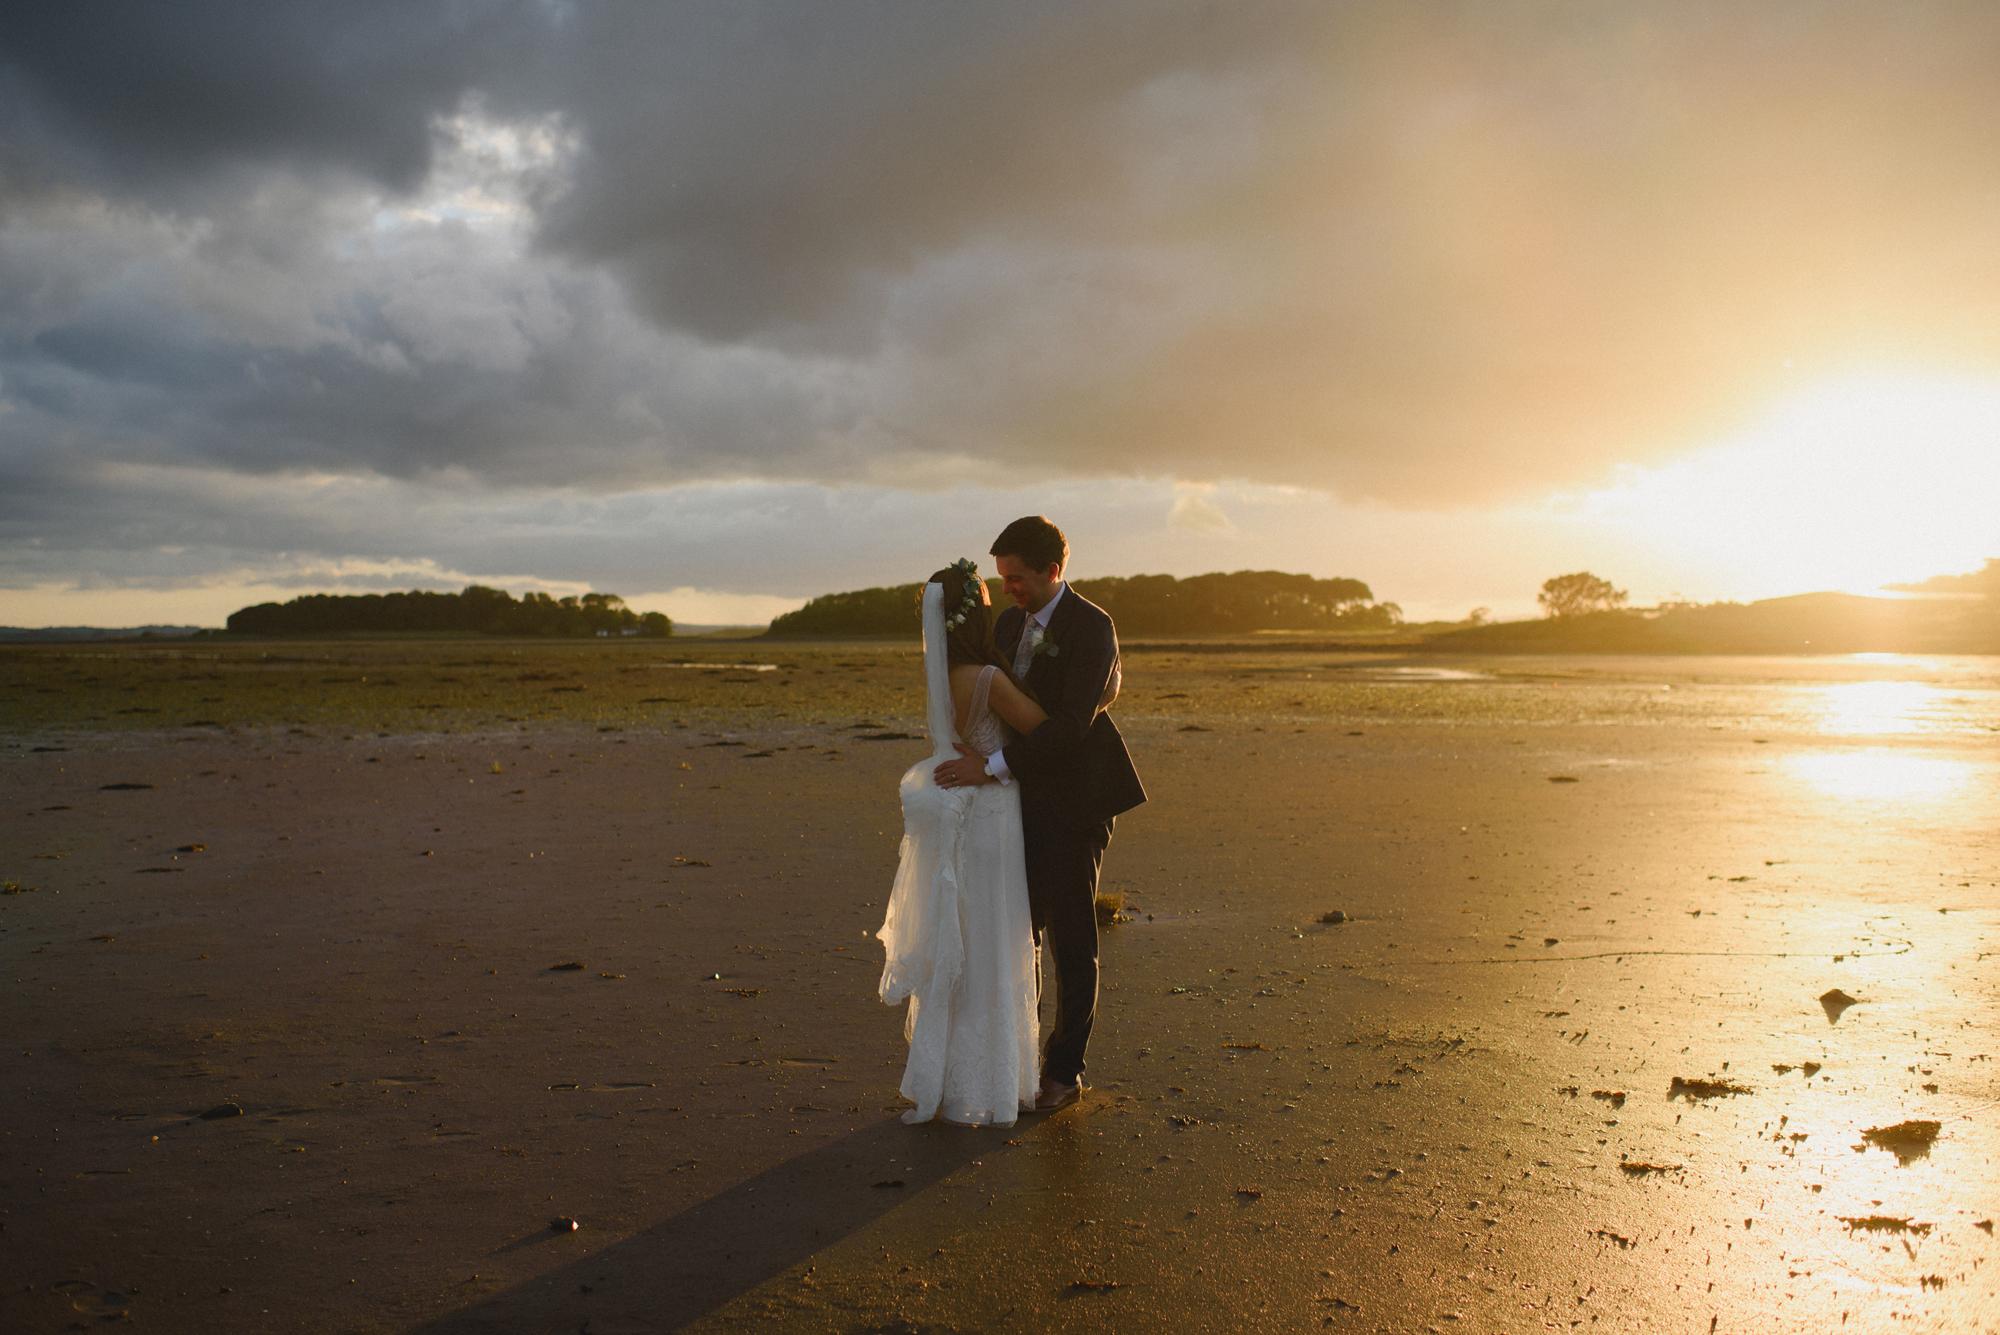 Orange_tree_house_Wedding_you_them_us_inspire_Weddings_4.jpg